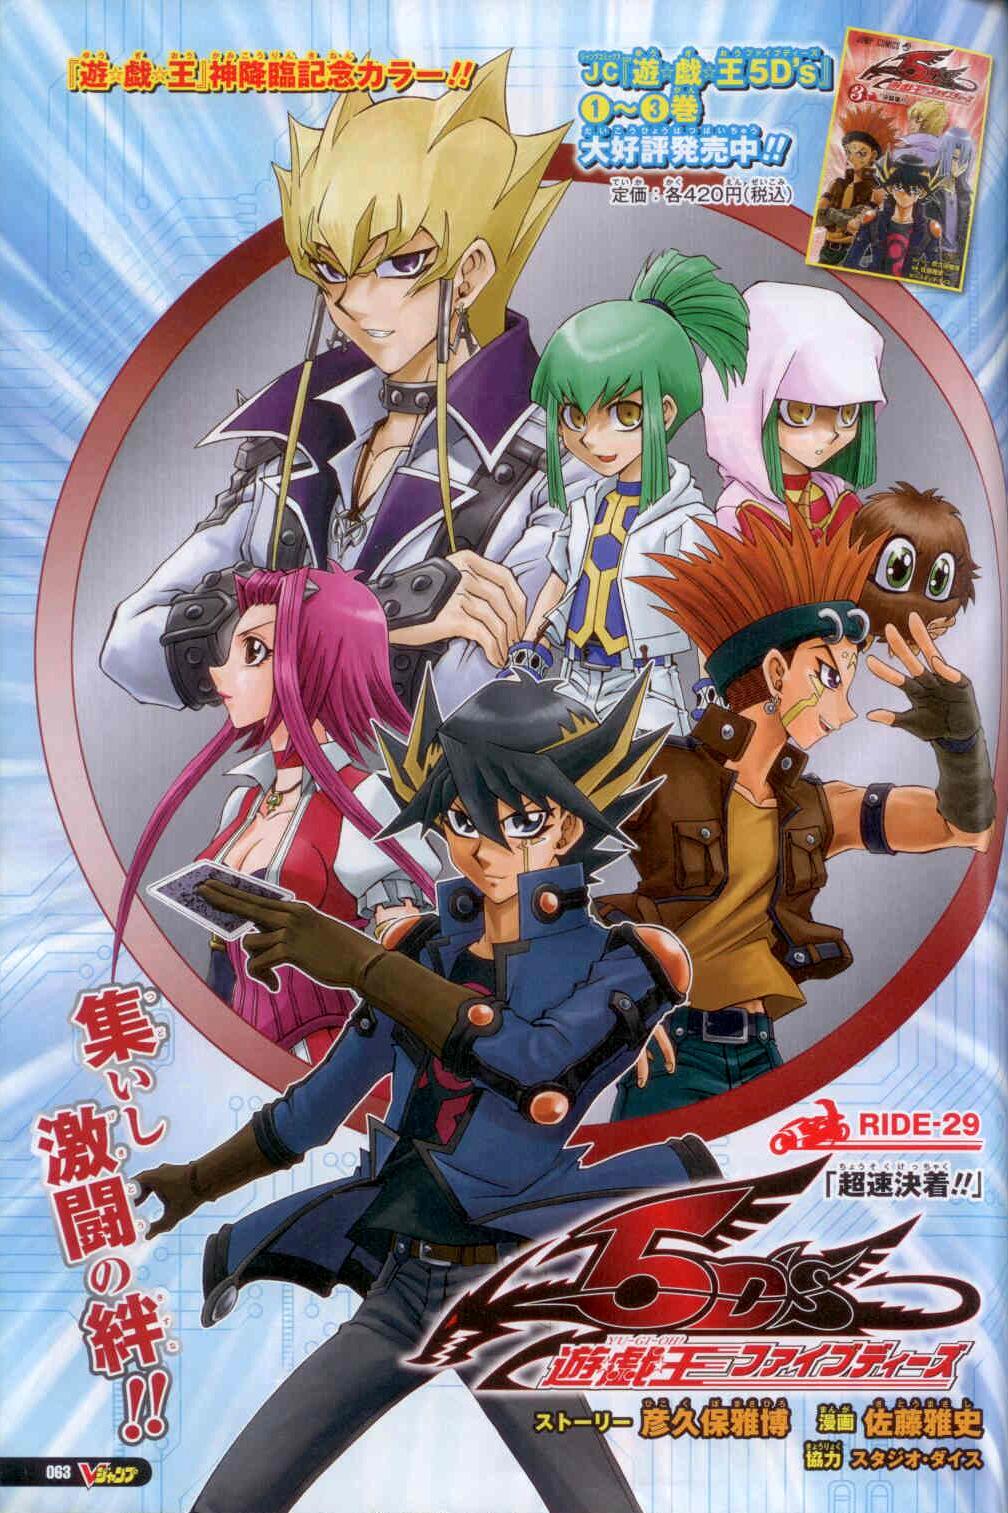 Yu-Gi-Oh! 5D's - Ride 029